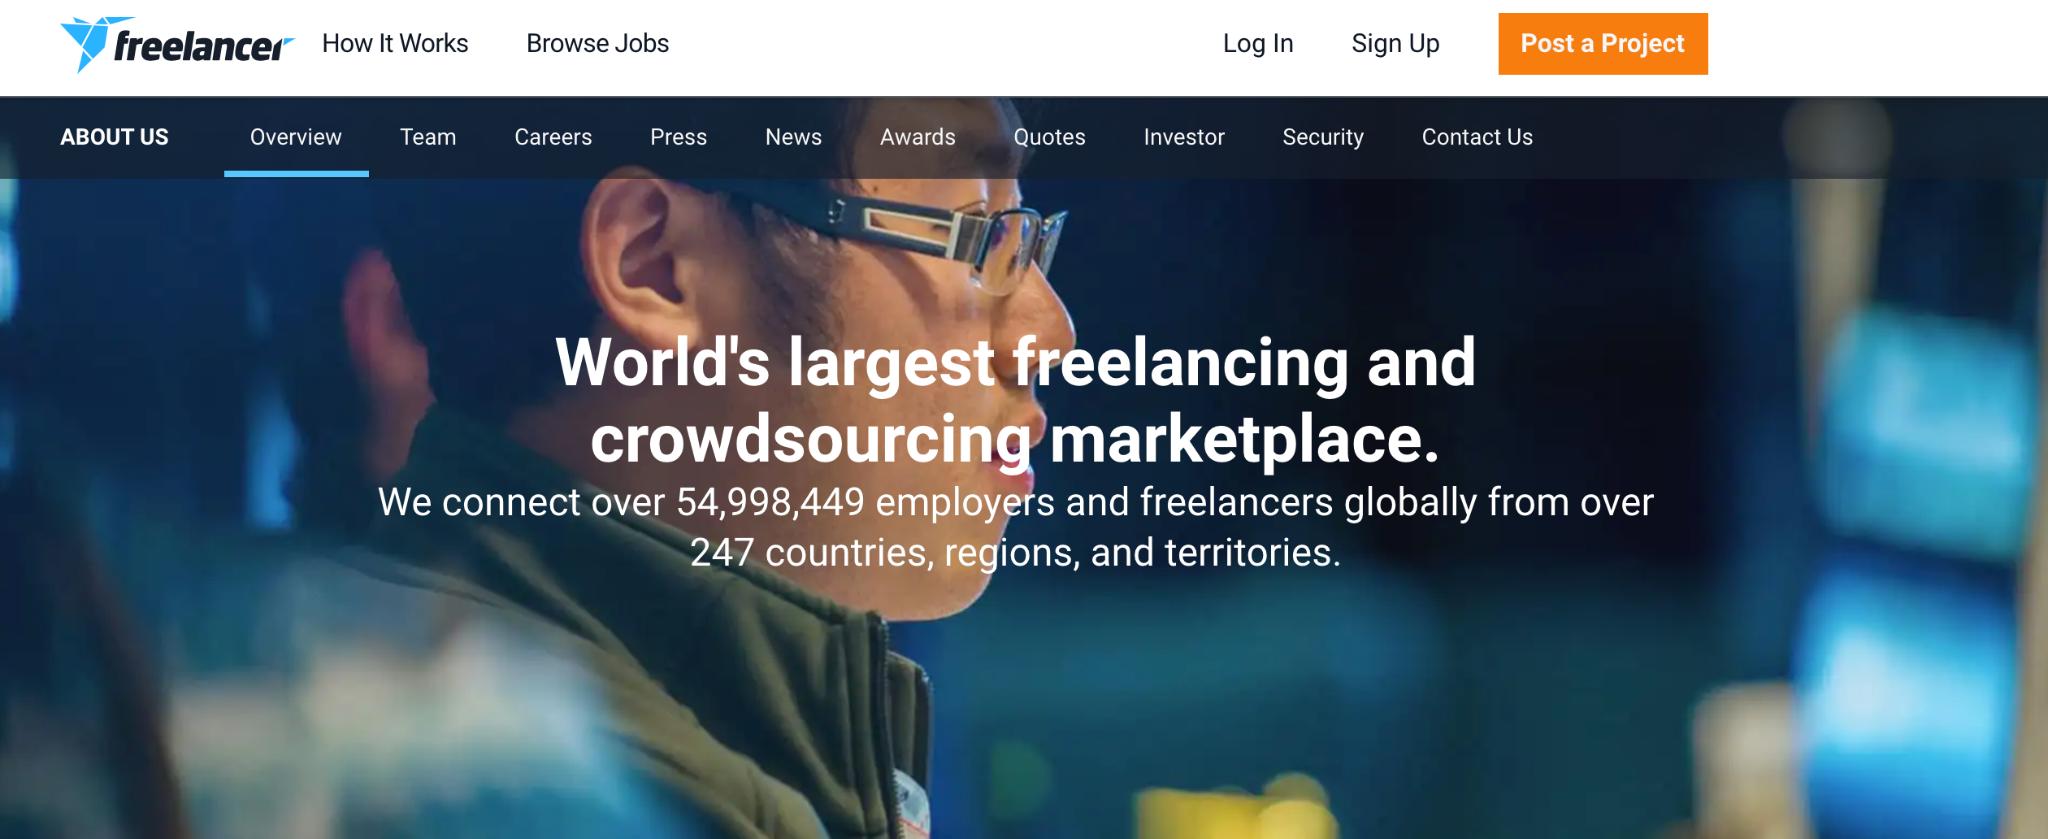 Screenshot from Freelancer's website